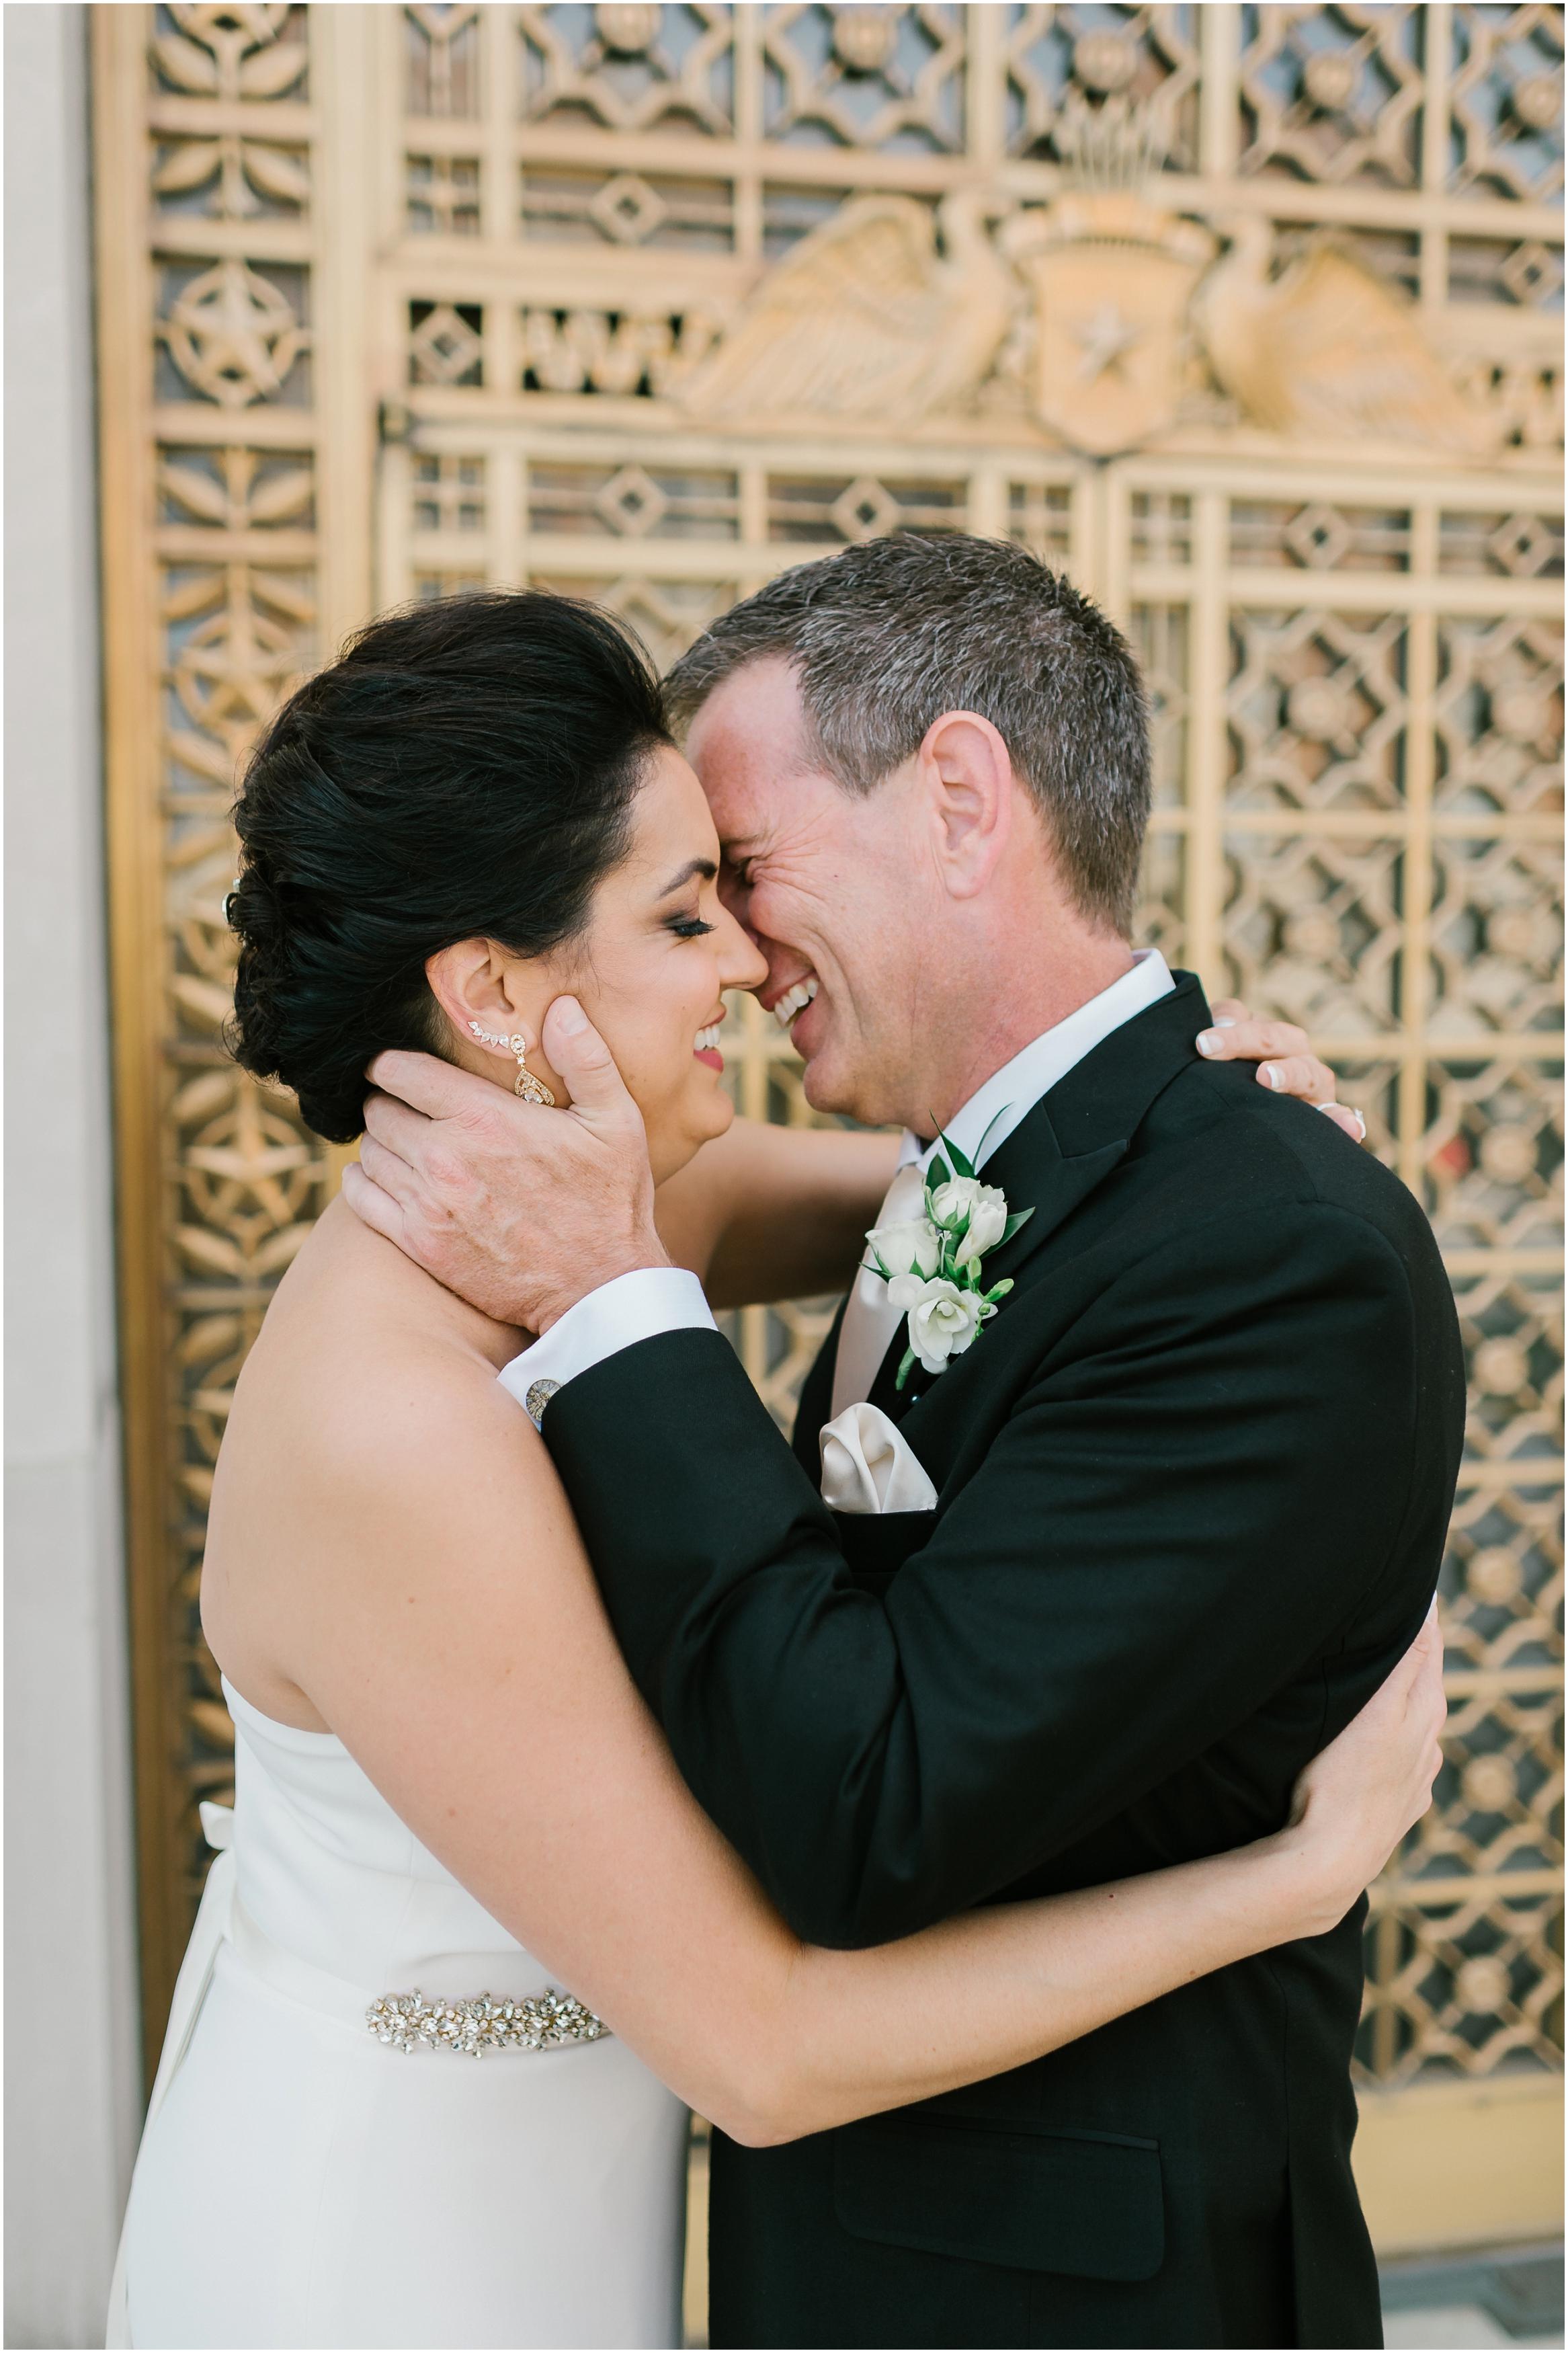 Rebecca_Shehorn_Photography_Indianapolis_Wedding_Photographer_8552.jpg